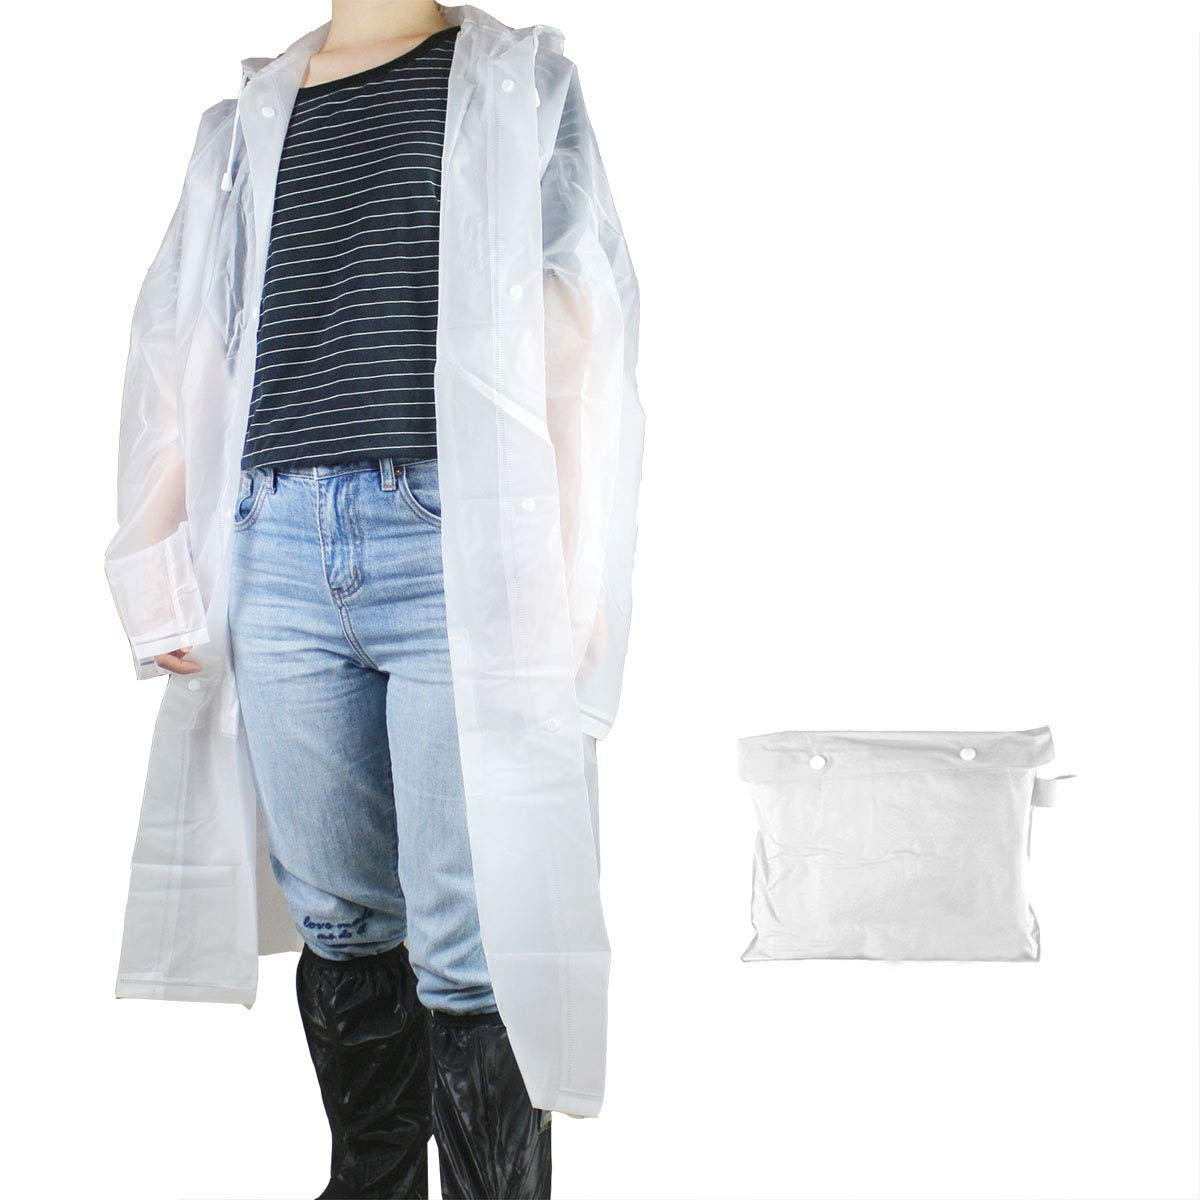 Extra Long Reusable Waterproof Rainwear Frelaxy Portable High Density EVA Rain Poncho Raincoat with Carrying Bag Wide Brim Hood and Pocket